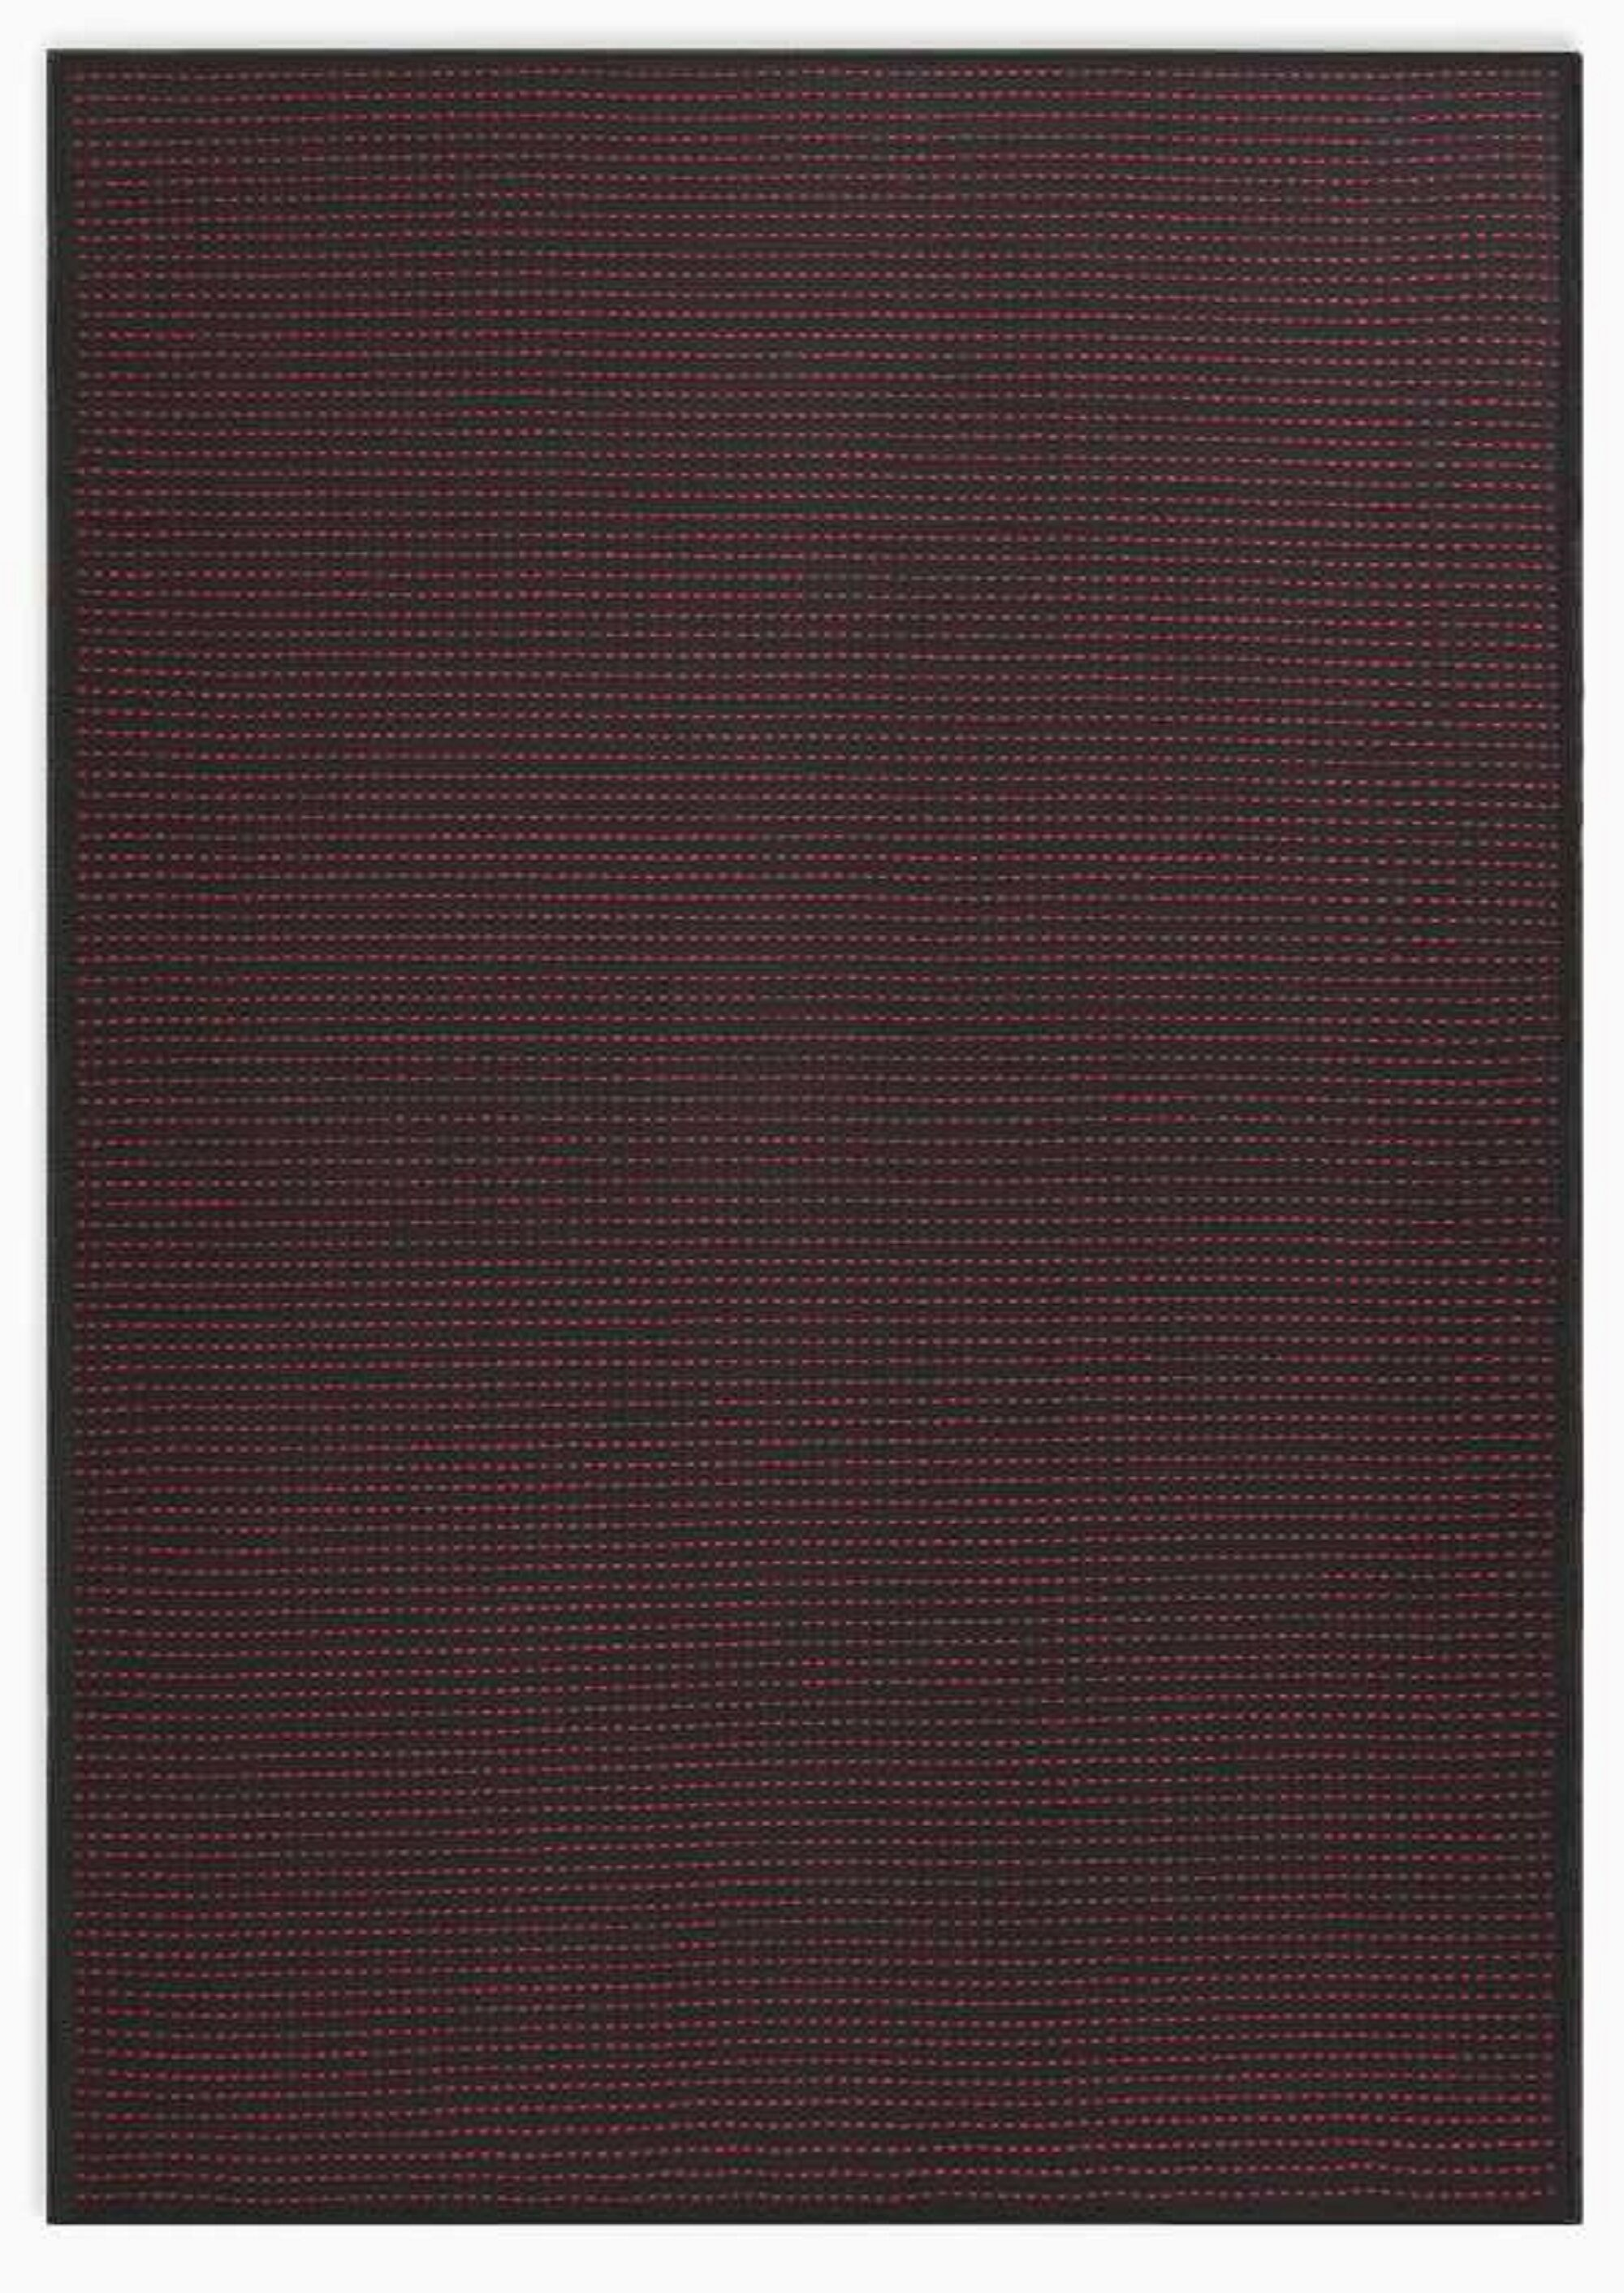 Seattle Hand-Woven Black/Magenta Indoor/Outdoor Area Rug Rug Size: Rectangle 8' x 10'